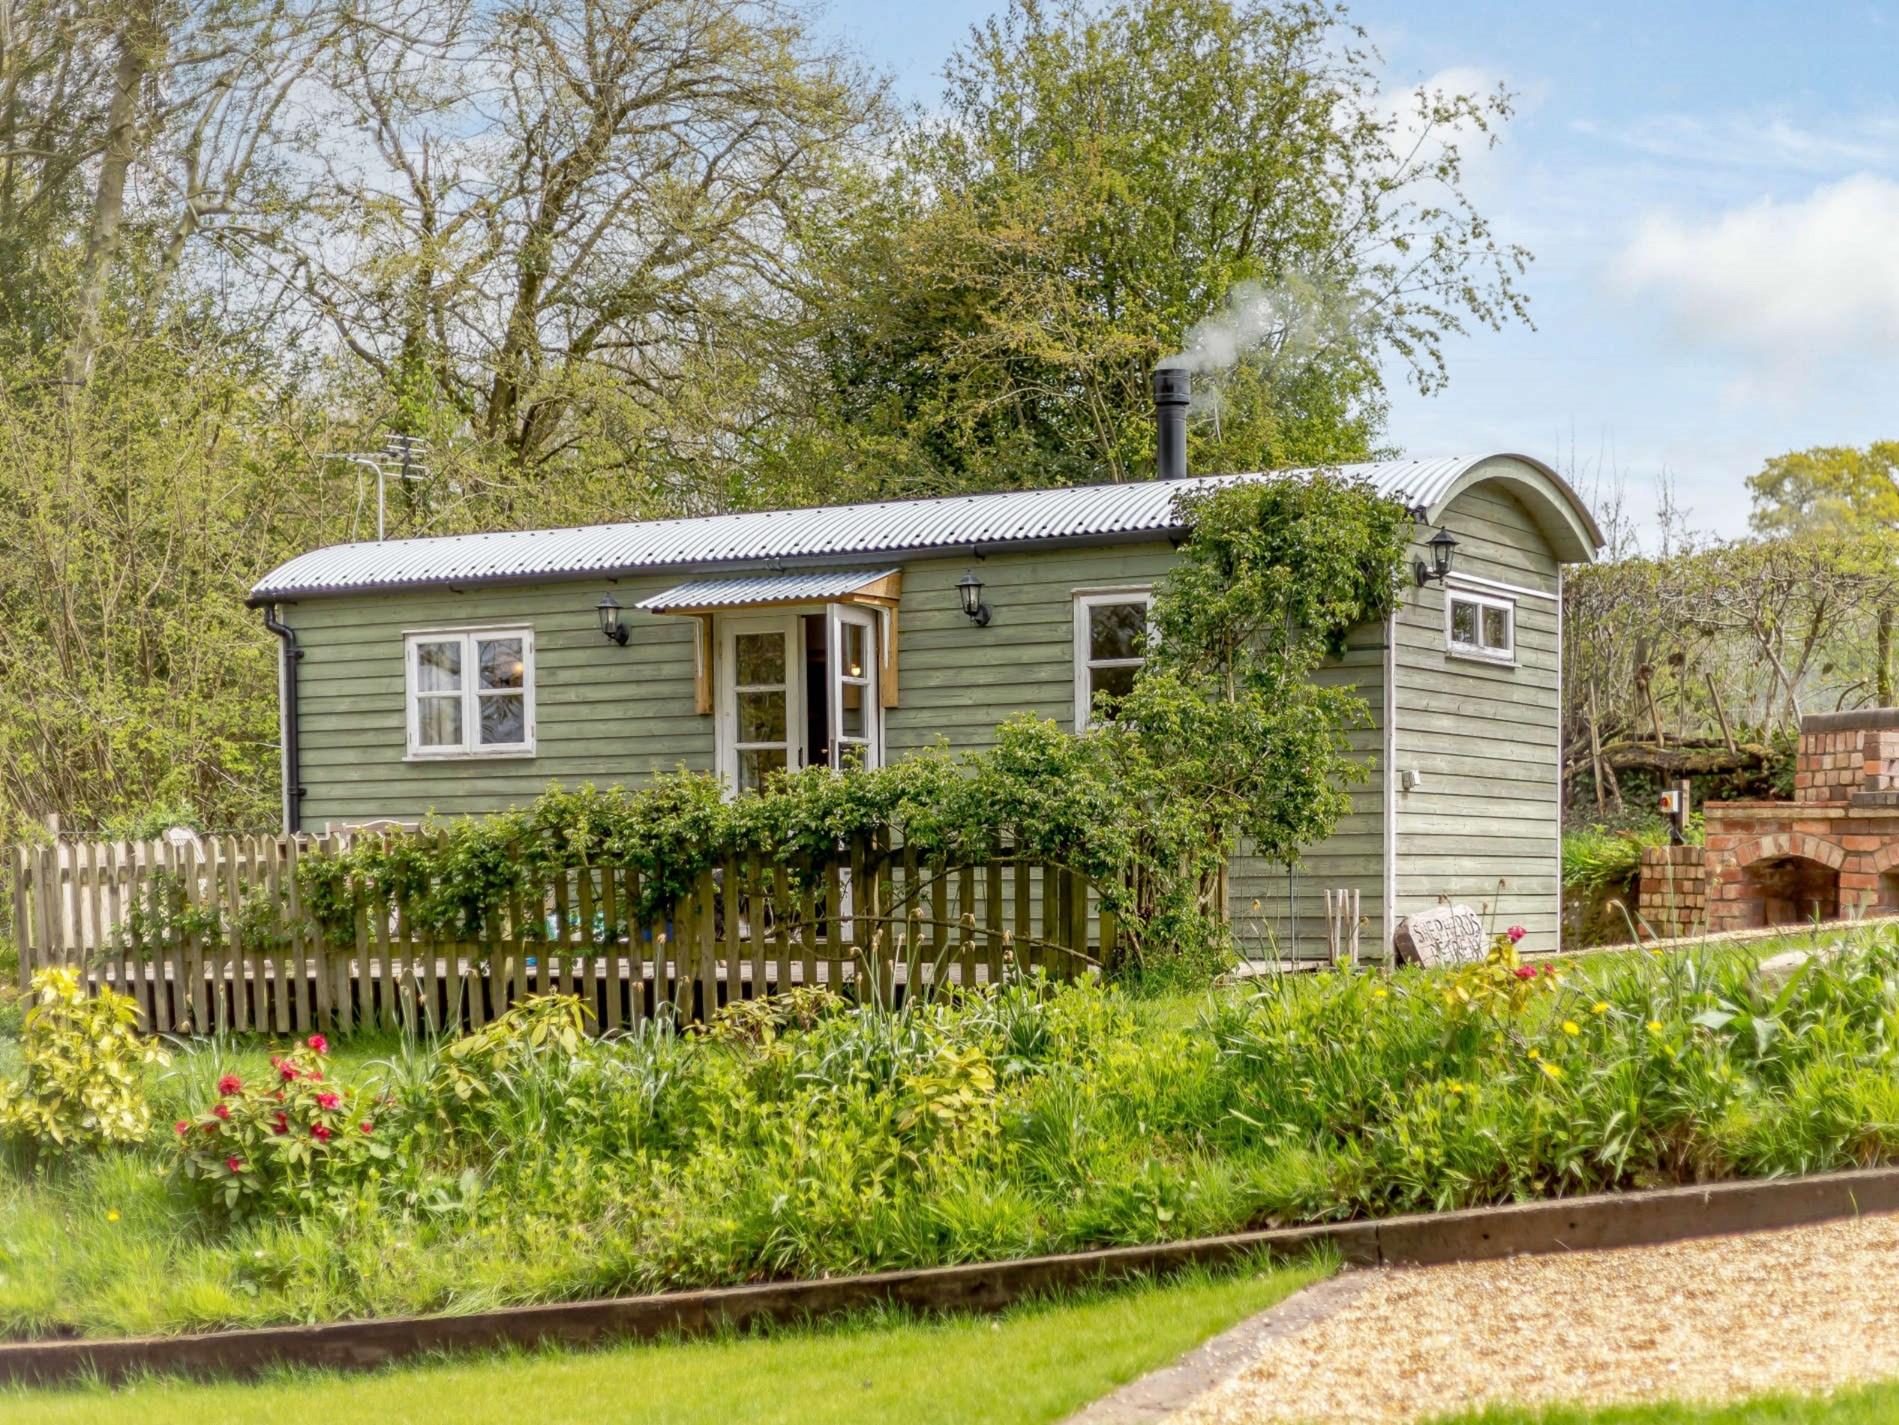 1 Bedroom Cottage in Shrewsbury, Heart of England